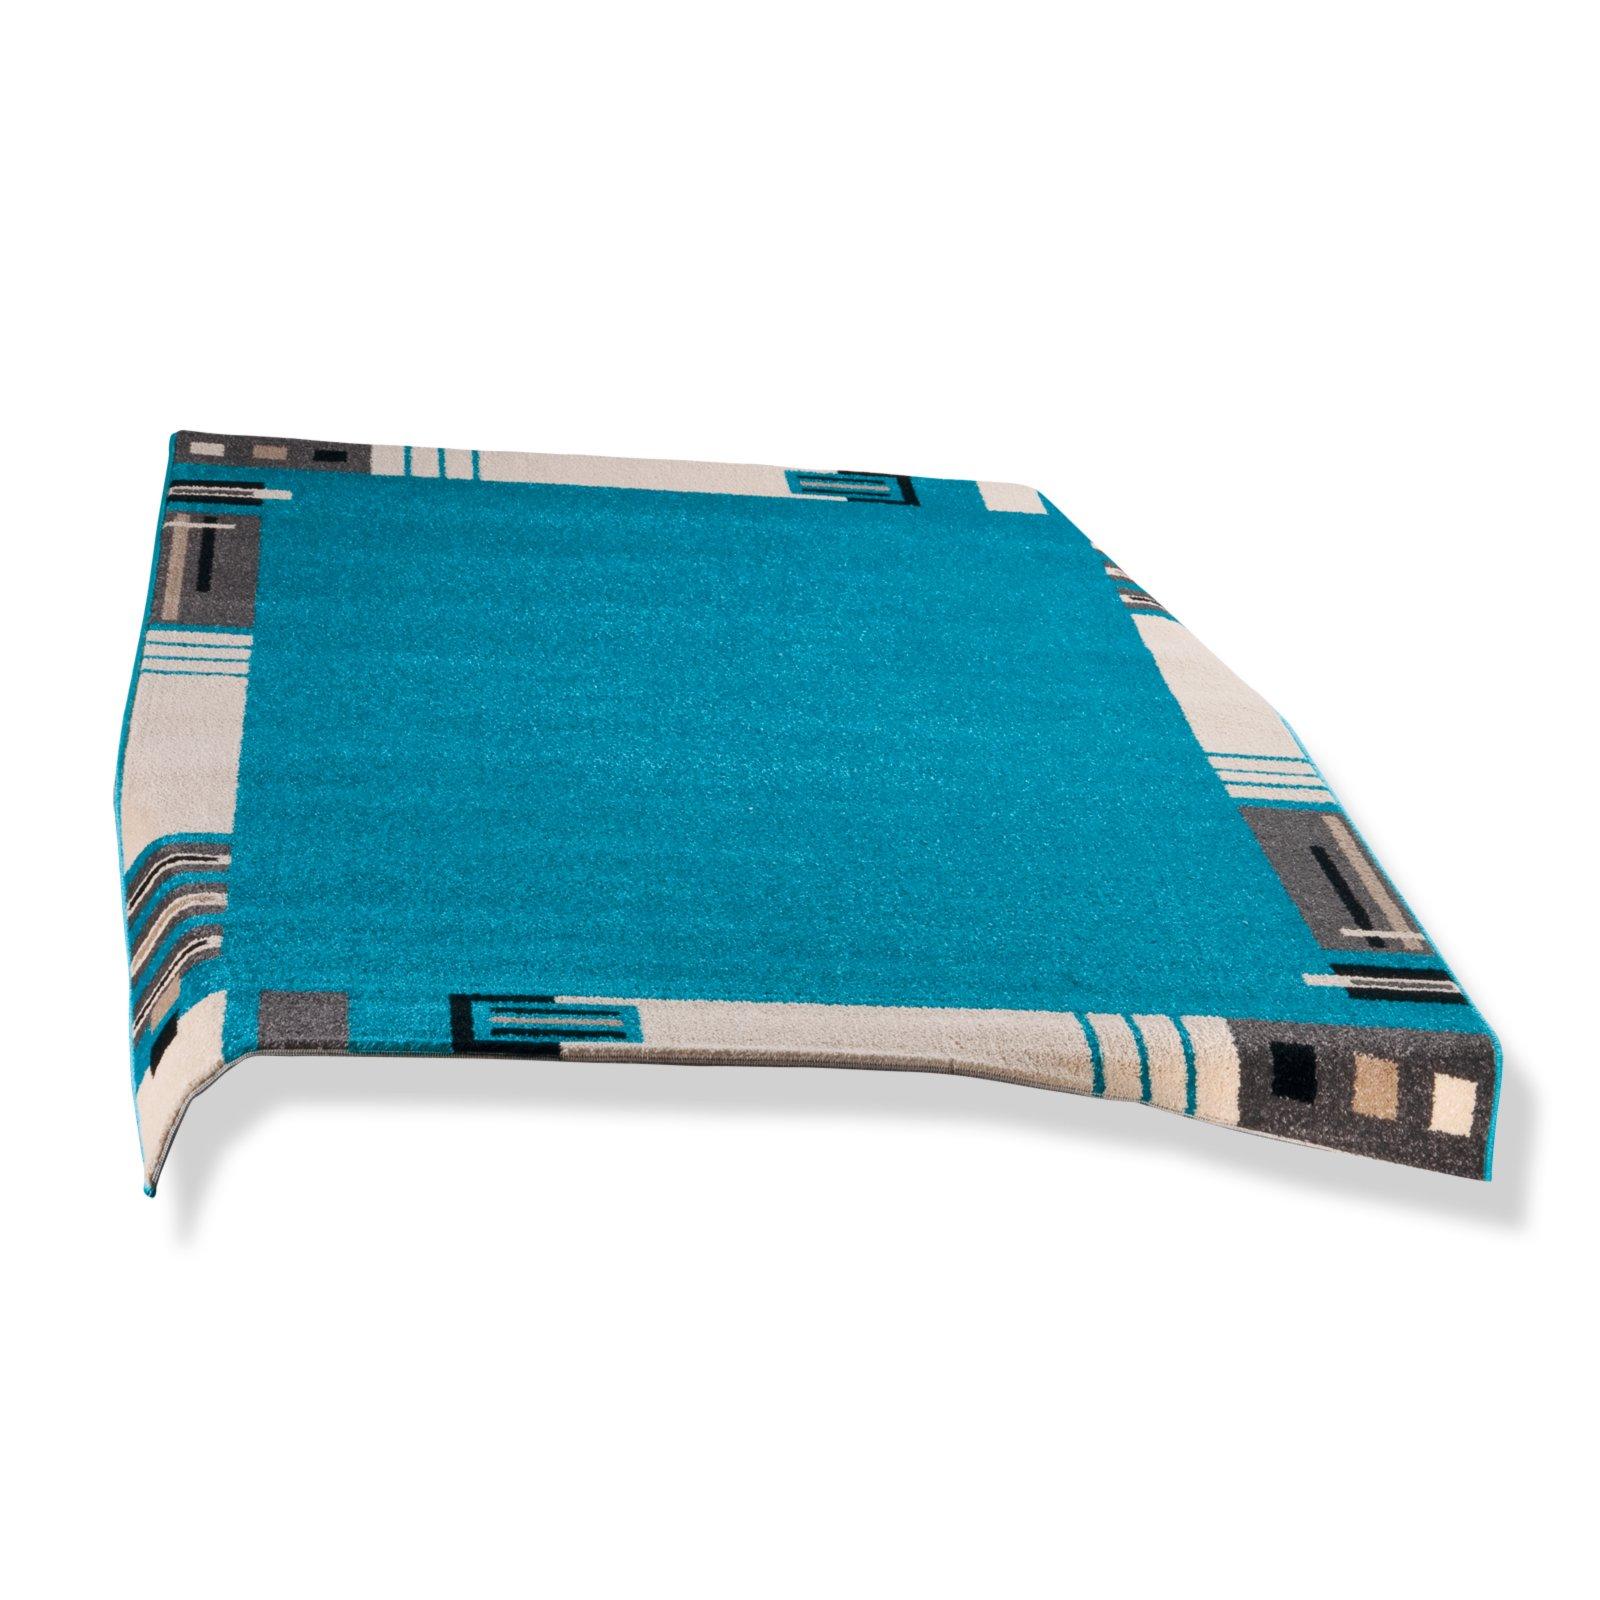 teppich t rkis 60x110 cm gemusterte teppiche. Black Bedroom Furniture Sets. Home Design Ideas